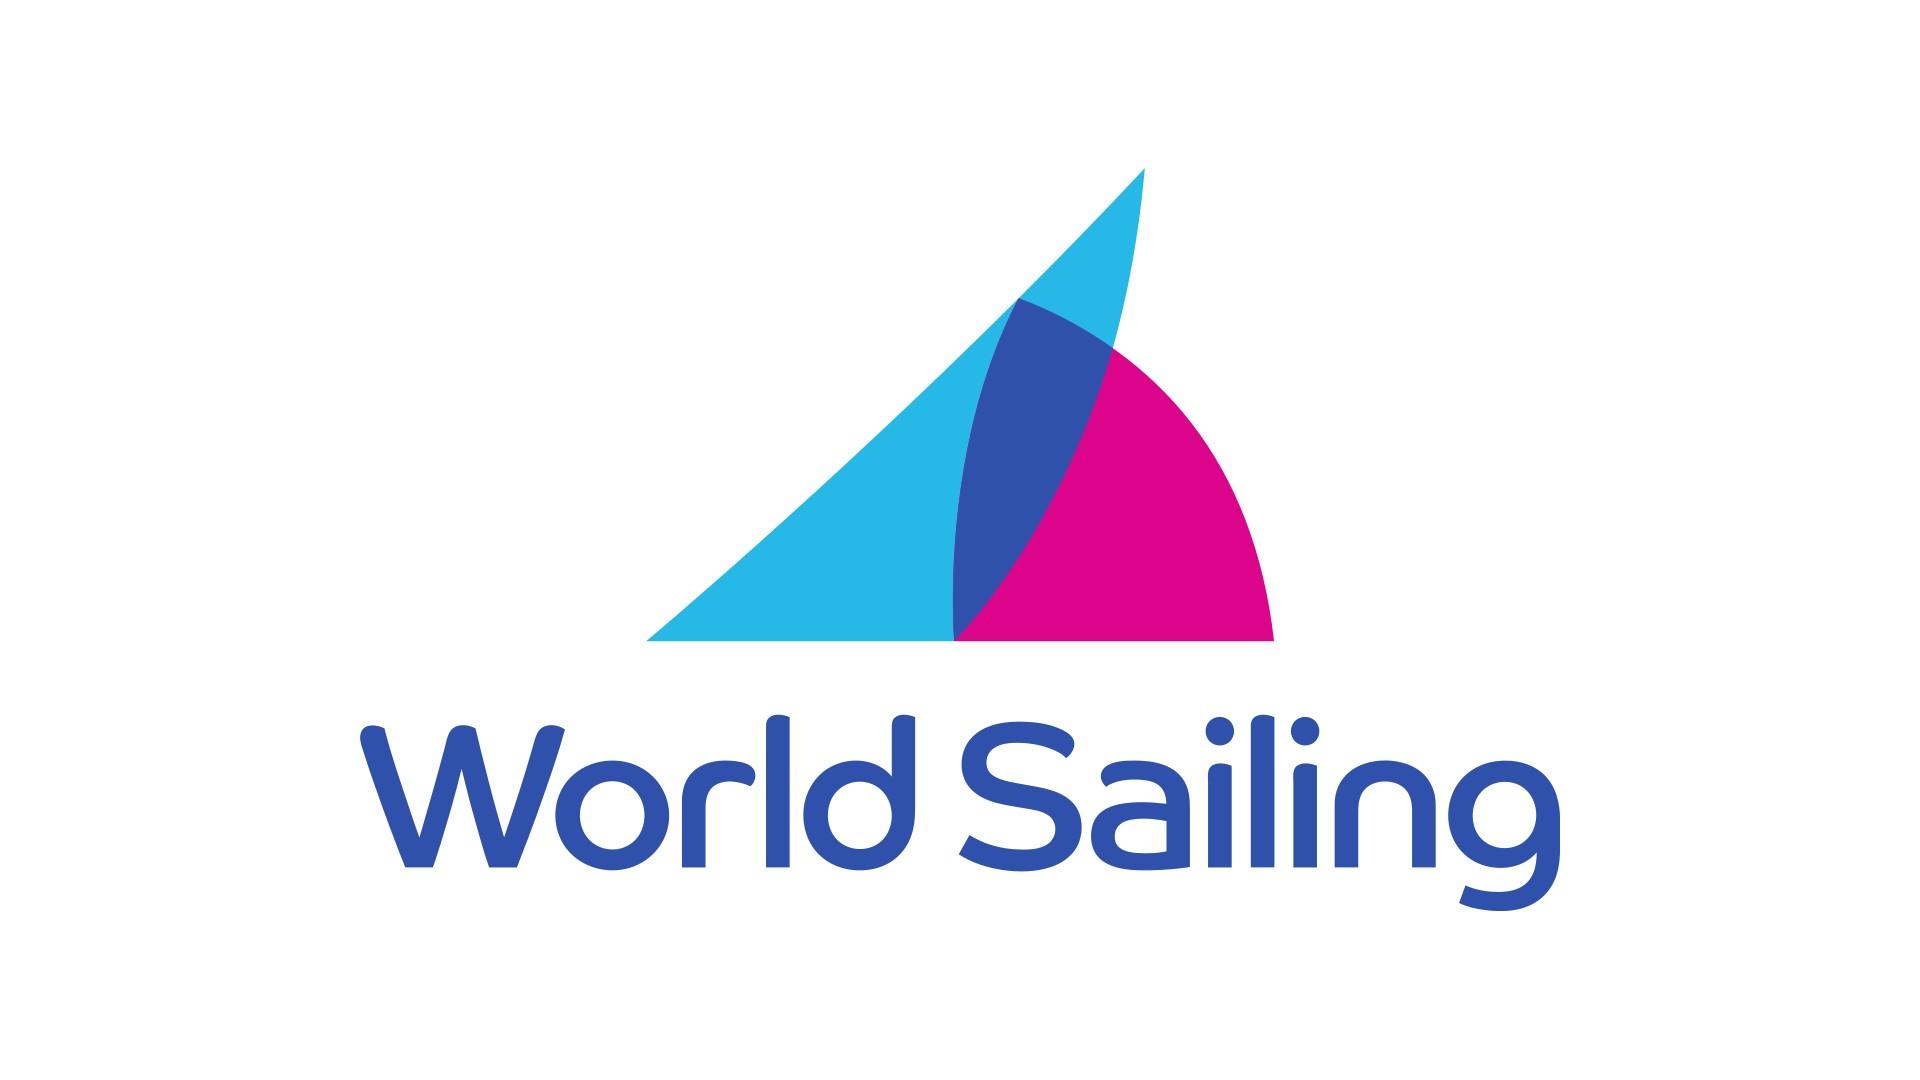 Voile – World Sailing (1) logo